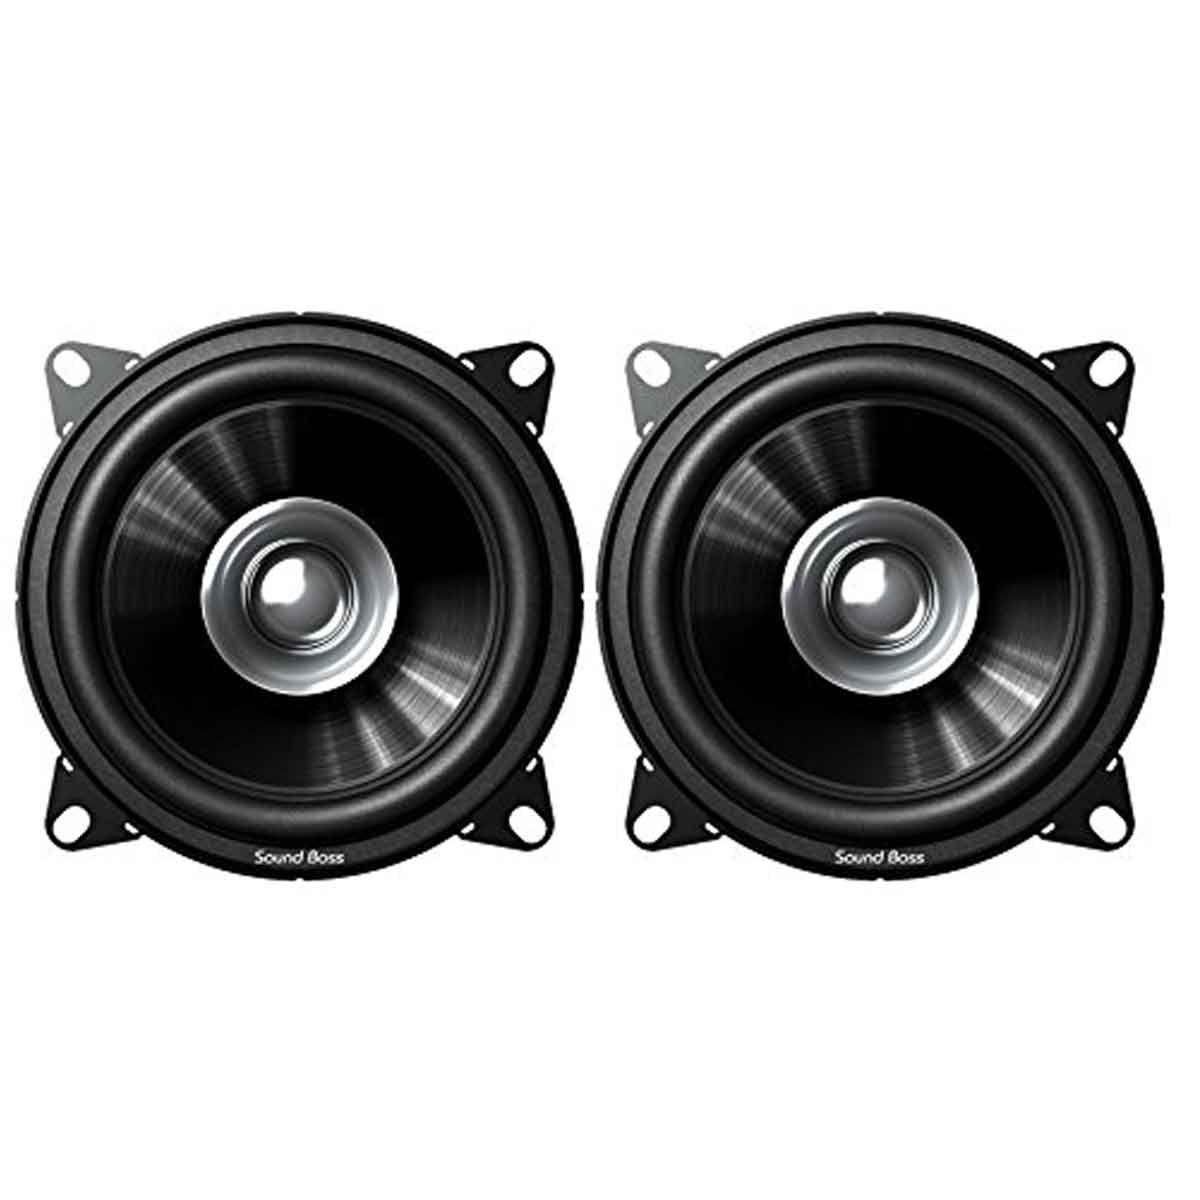 Sound Boss Car Speakers (B1015)